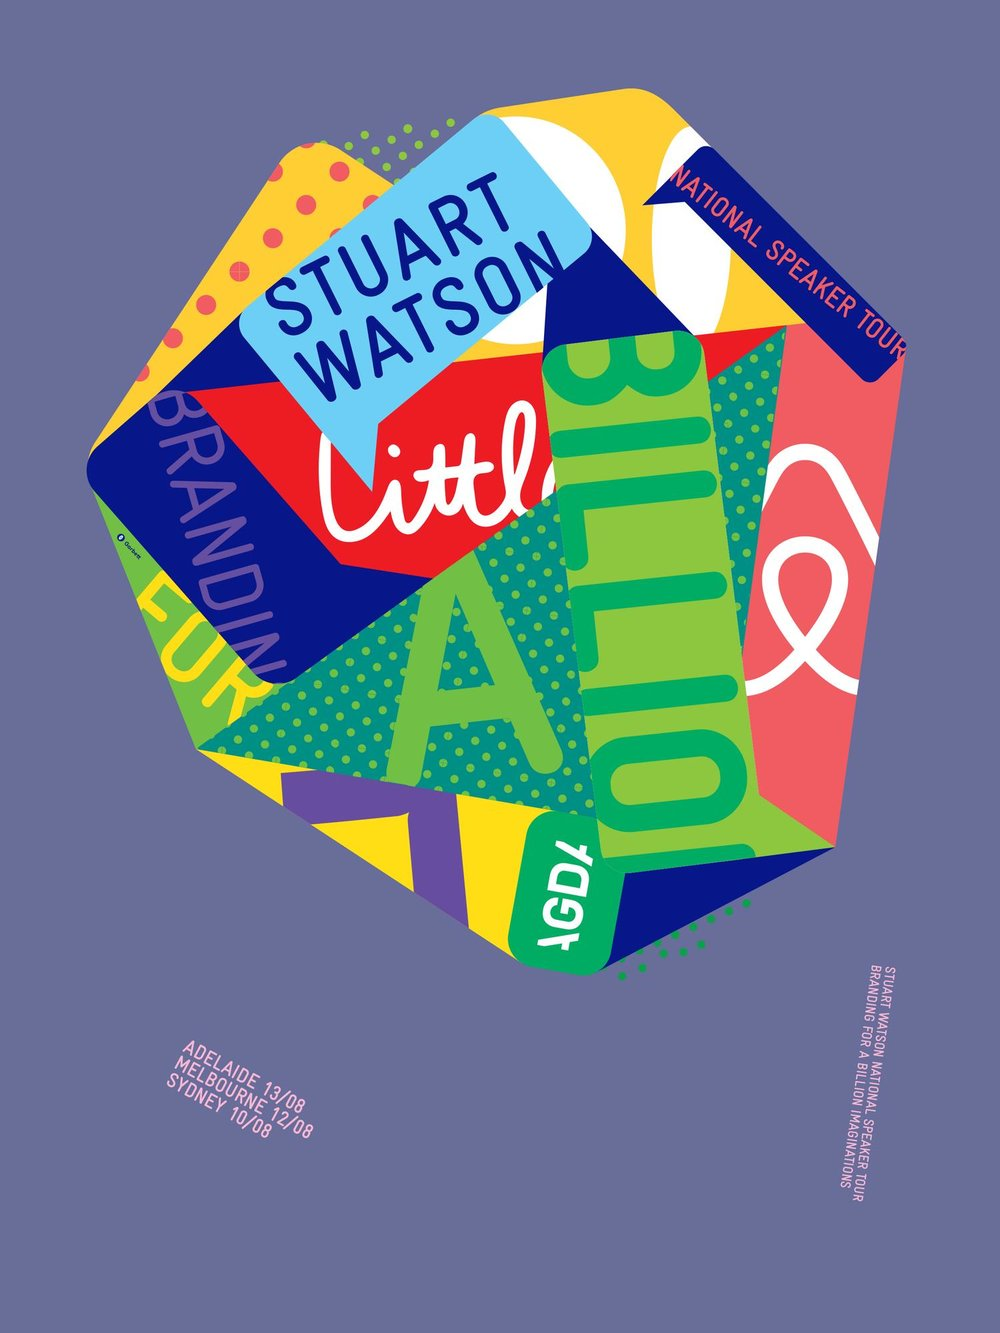 Paul Garbett  Graphic Designer garbett.com.au Surry Hills, AUS